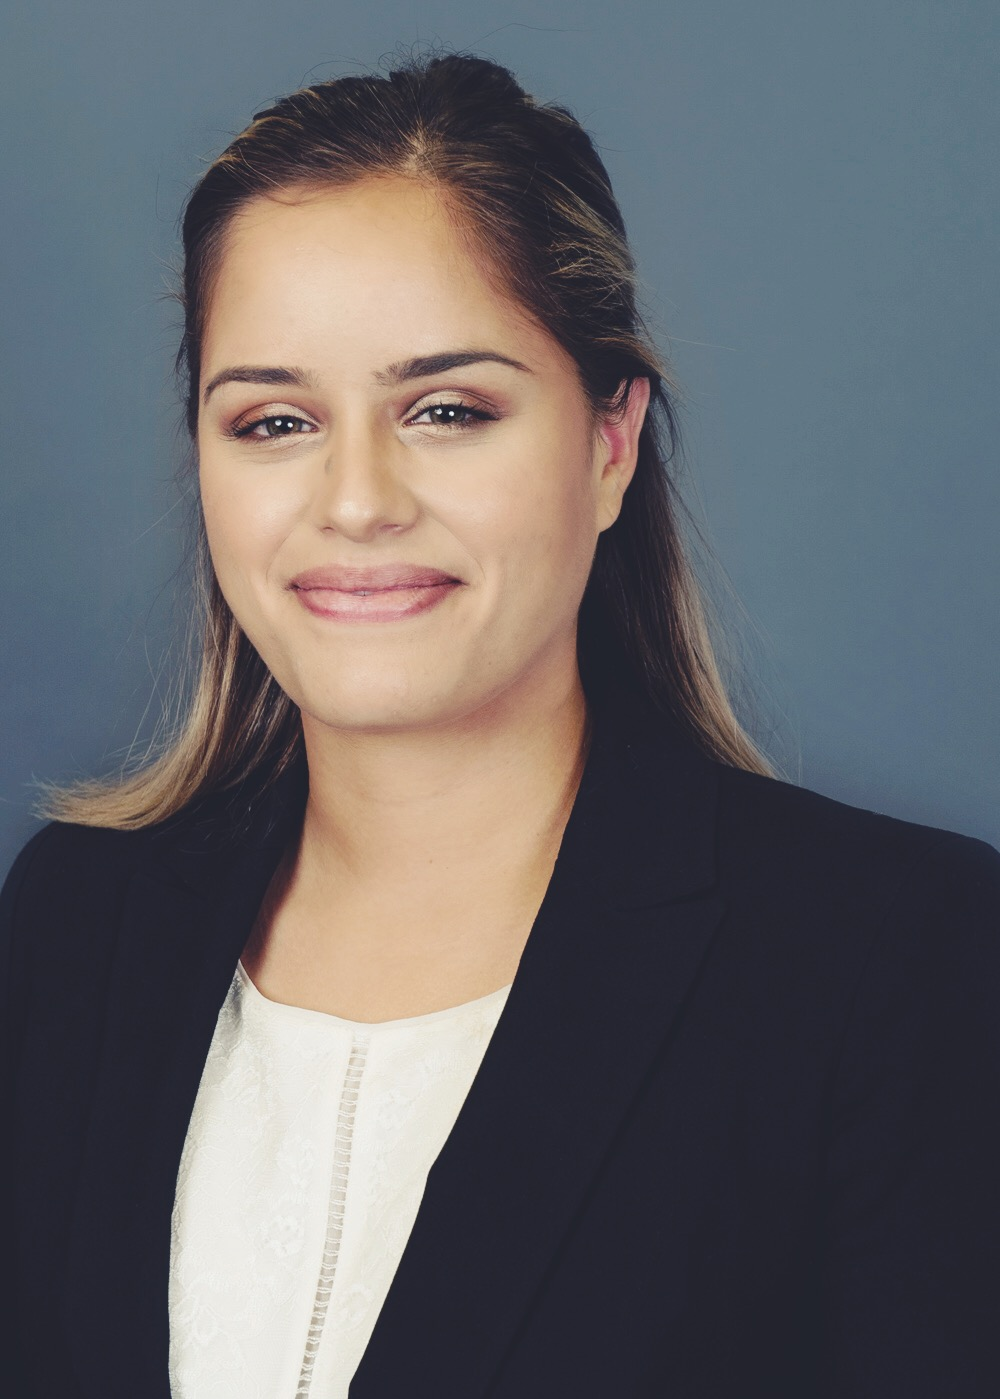 Lilian Guzman